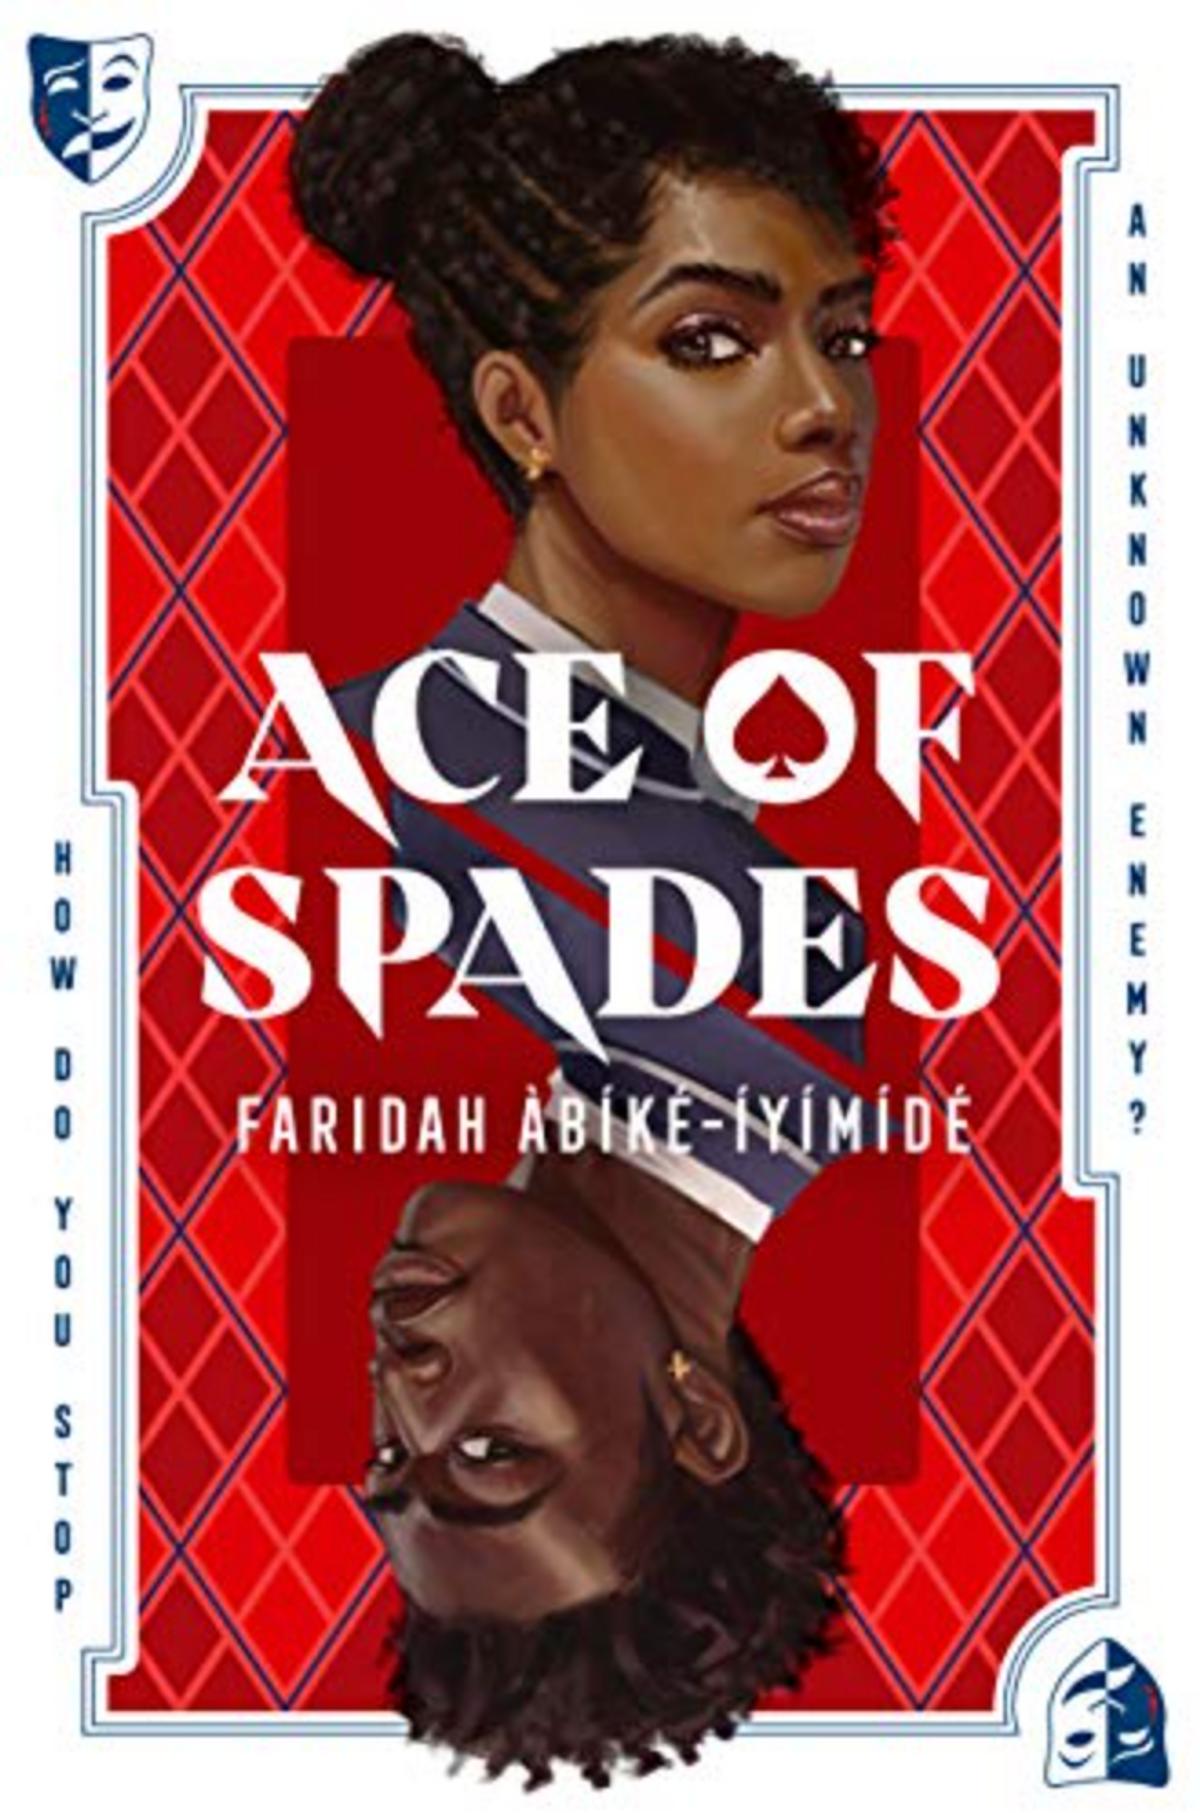 Ace of Spades by Faridah Àbíké-Íyímídé